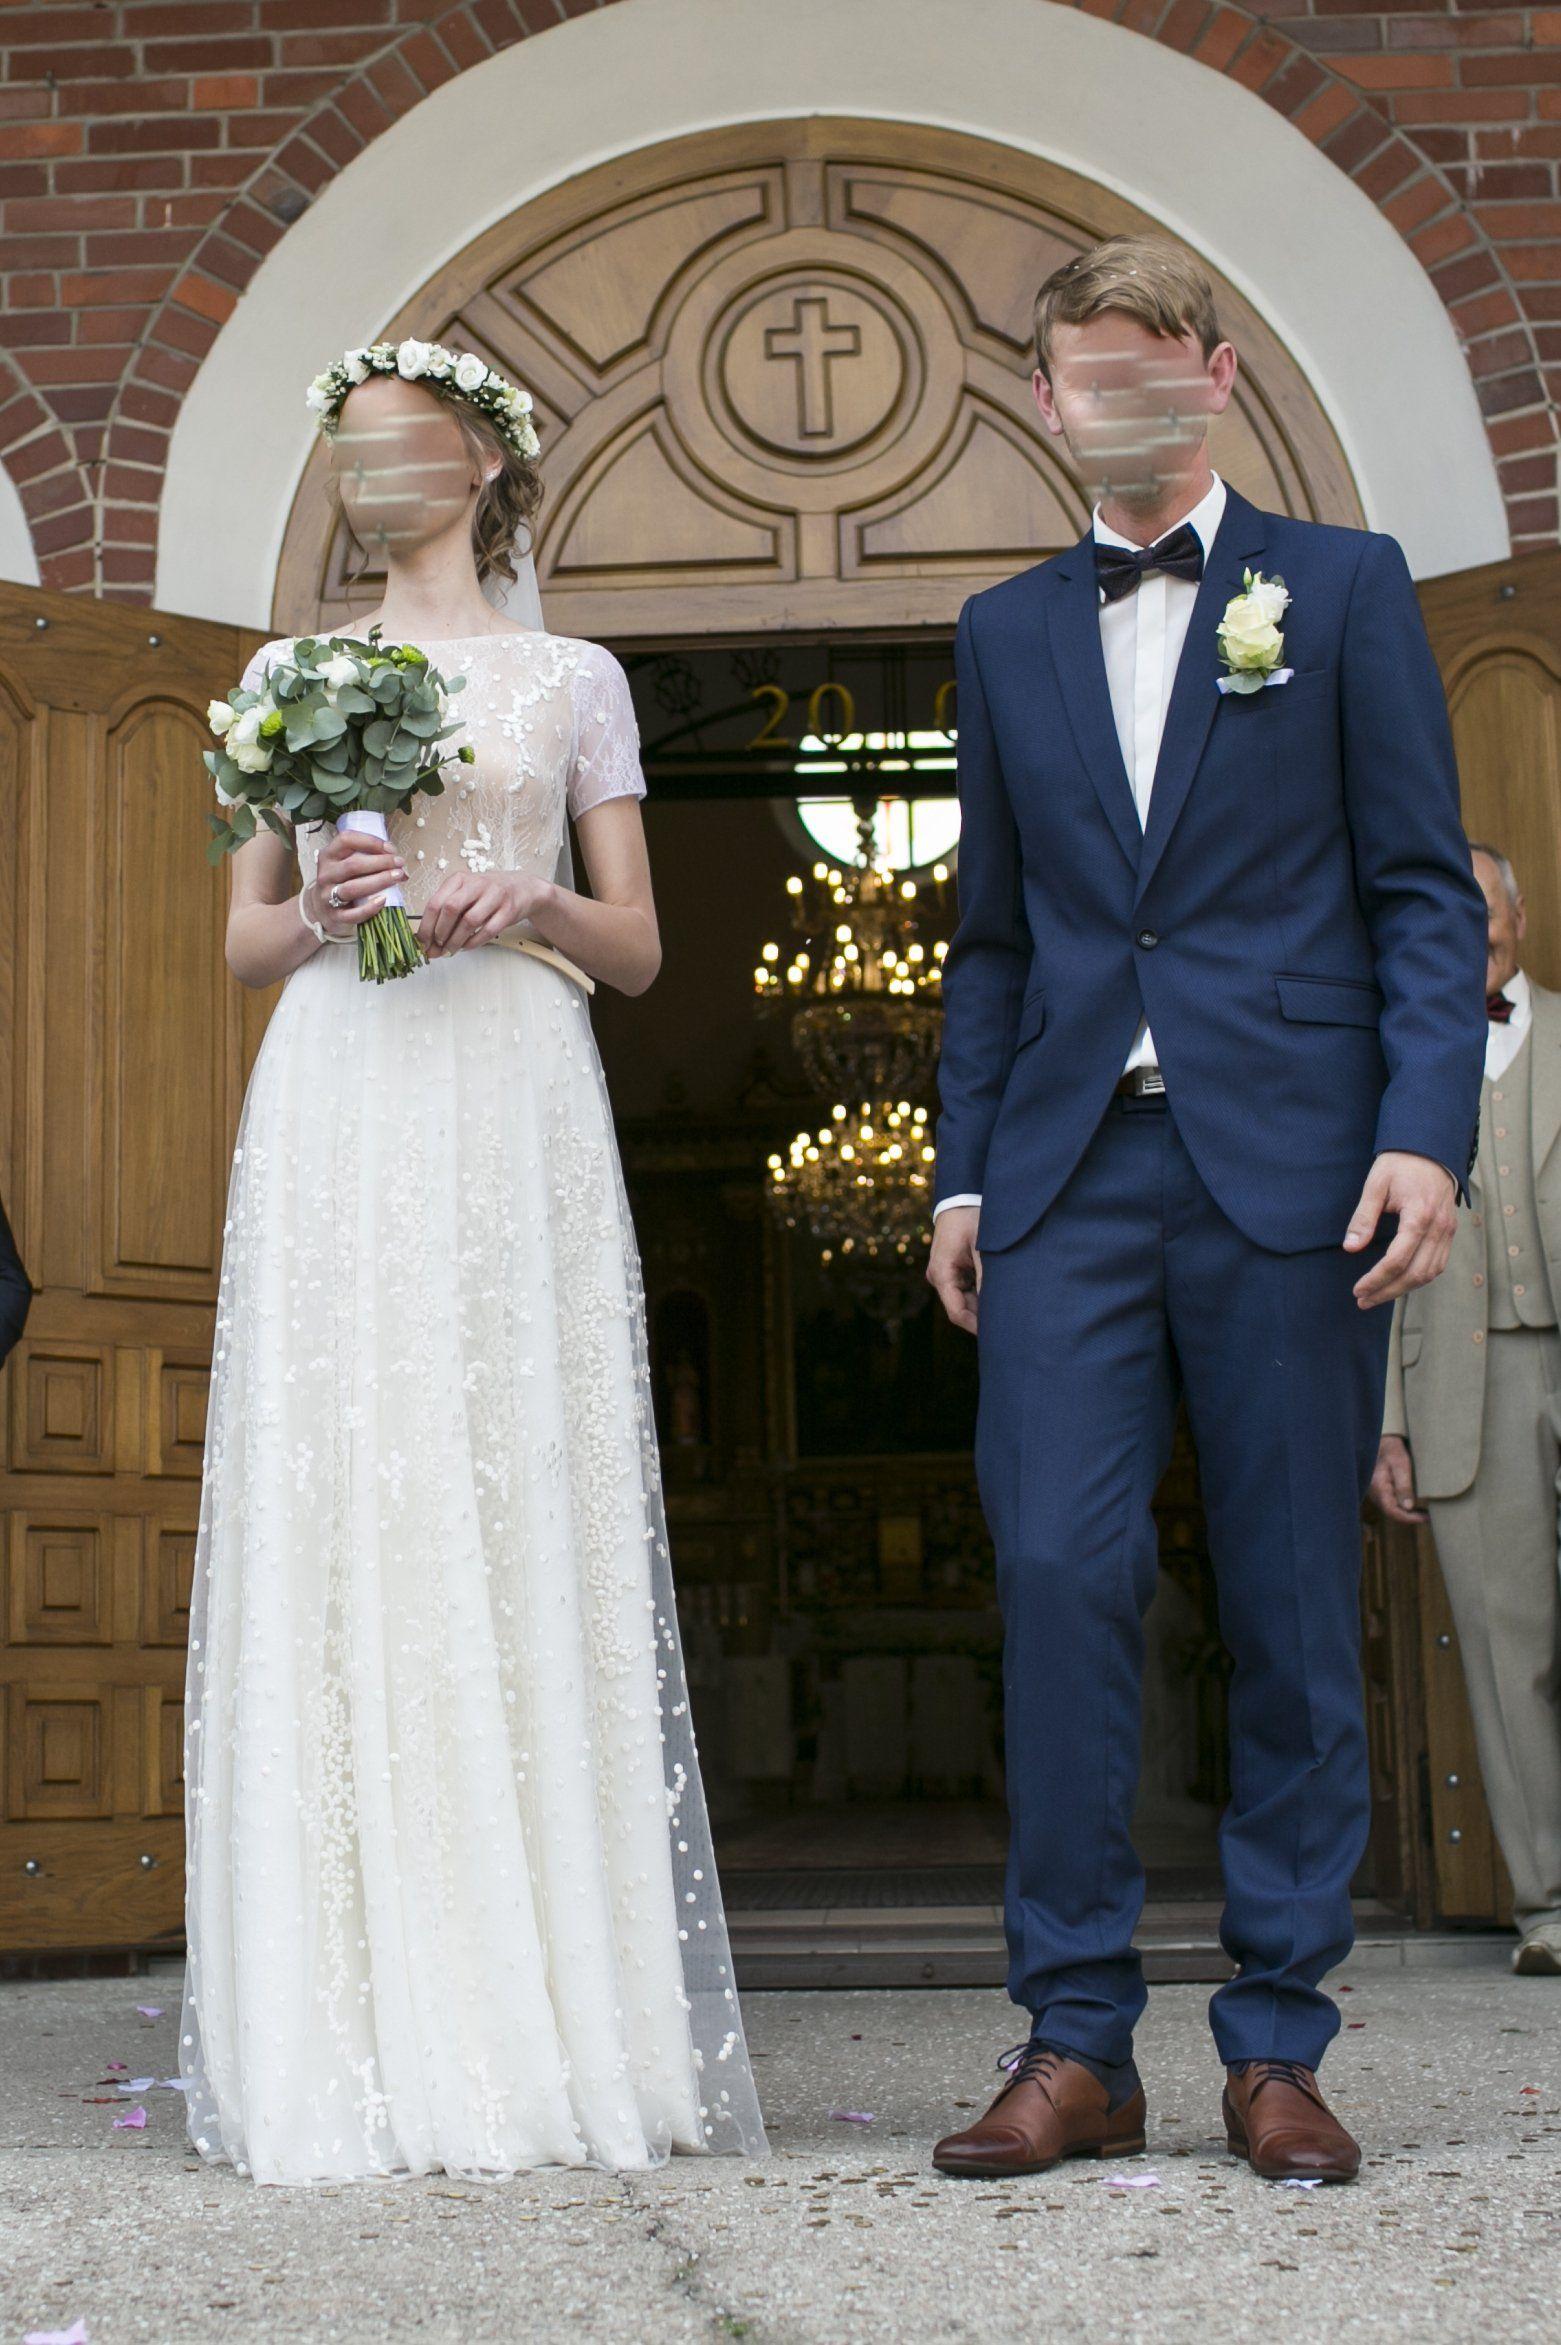 Suknia Slubna Jak Anna Kara Sandy 2017 6962320423 Oficjalne Archiwum Allegro Wedding Dresses Lace Dresses Wedding Dresses